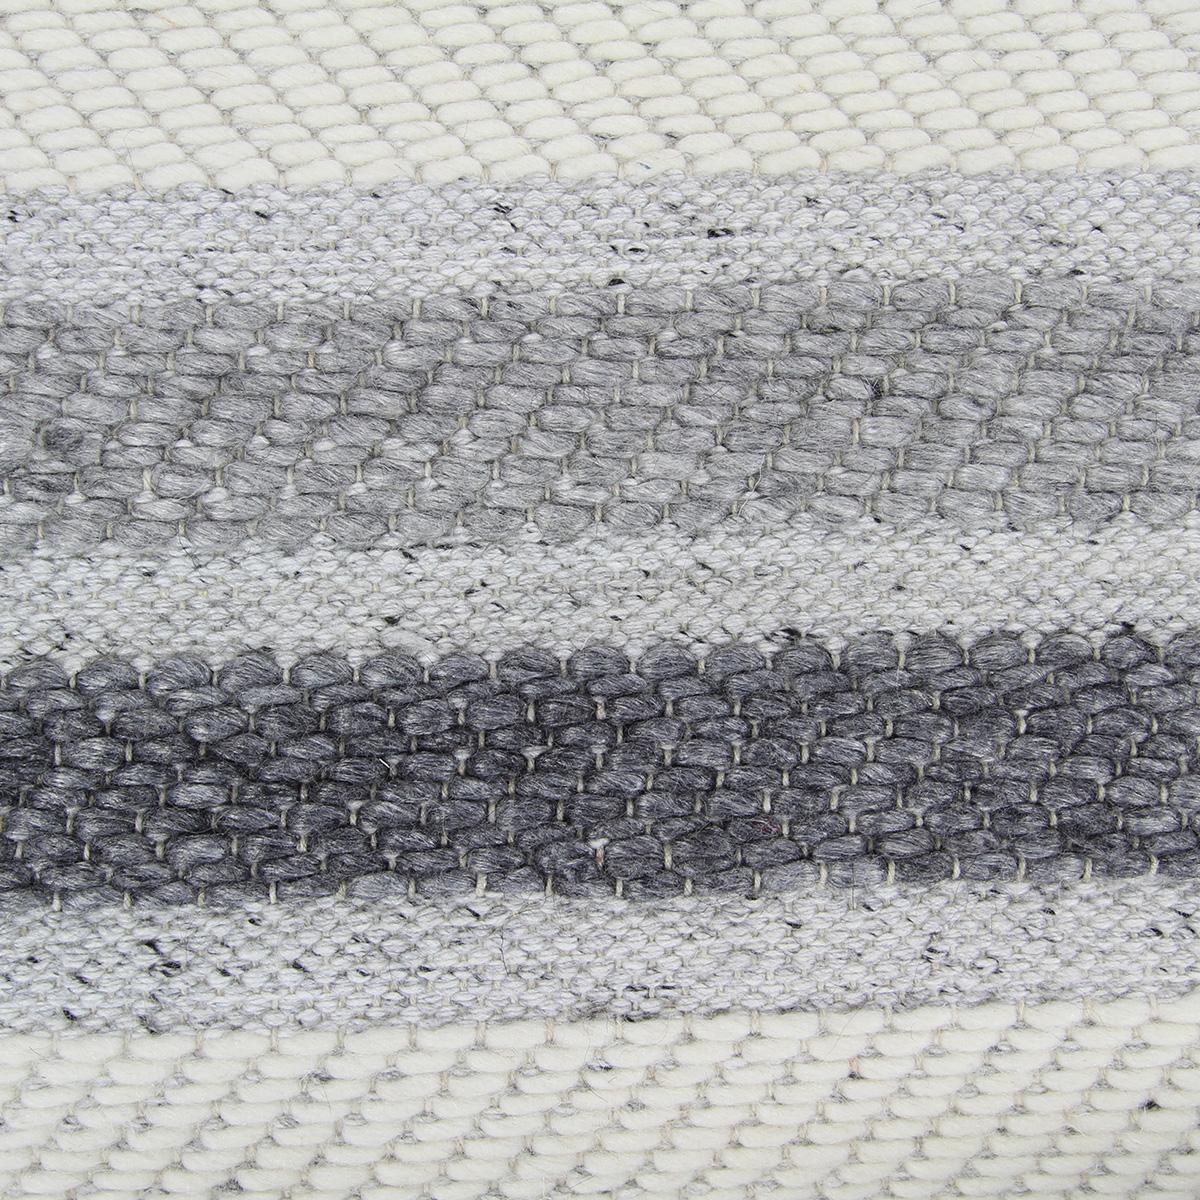 Vloerkleed Brinker Bridge Grey | 160 x 230 cm